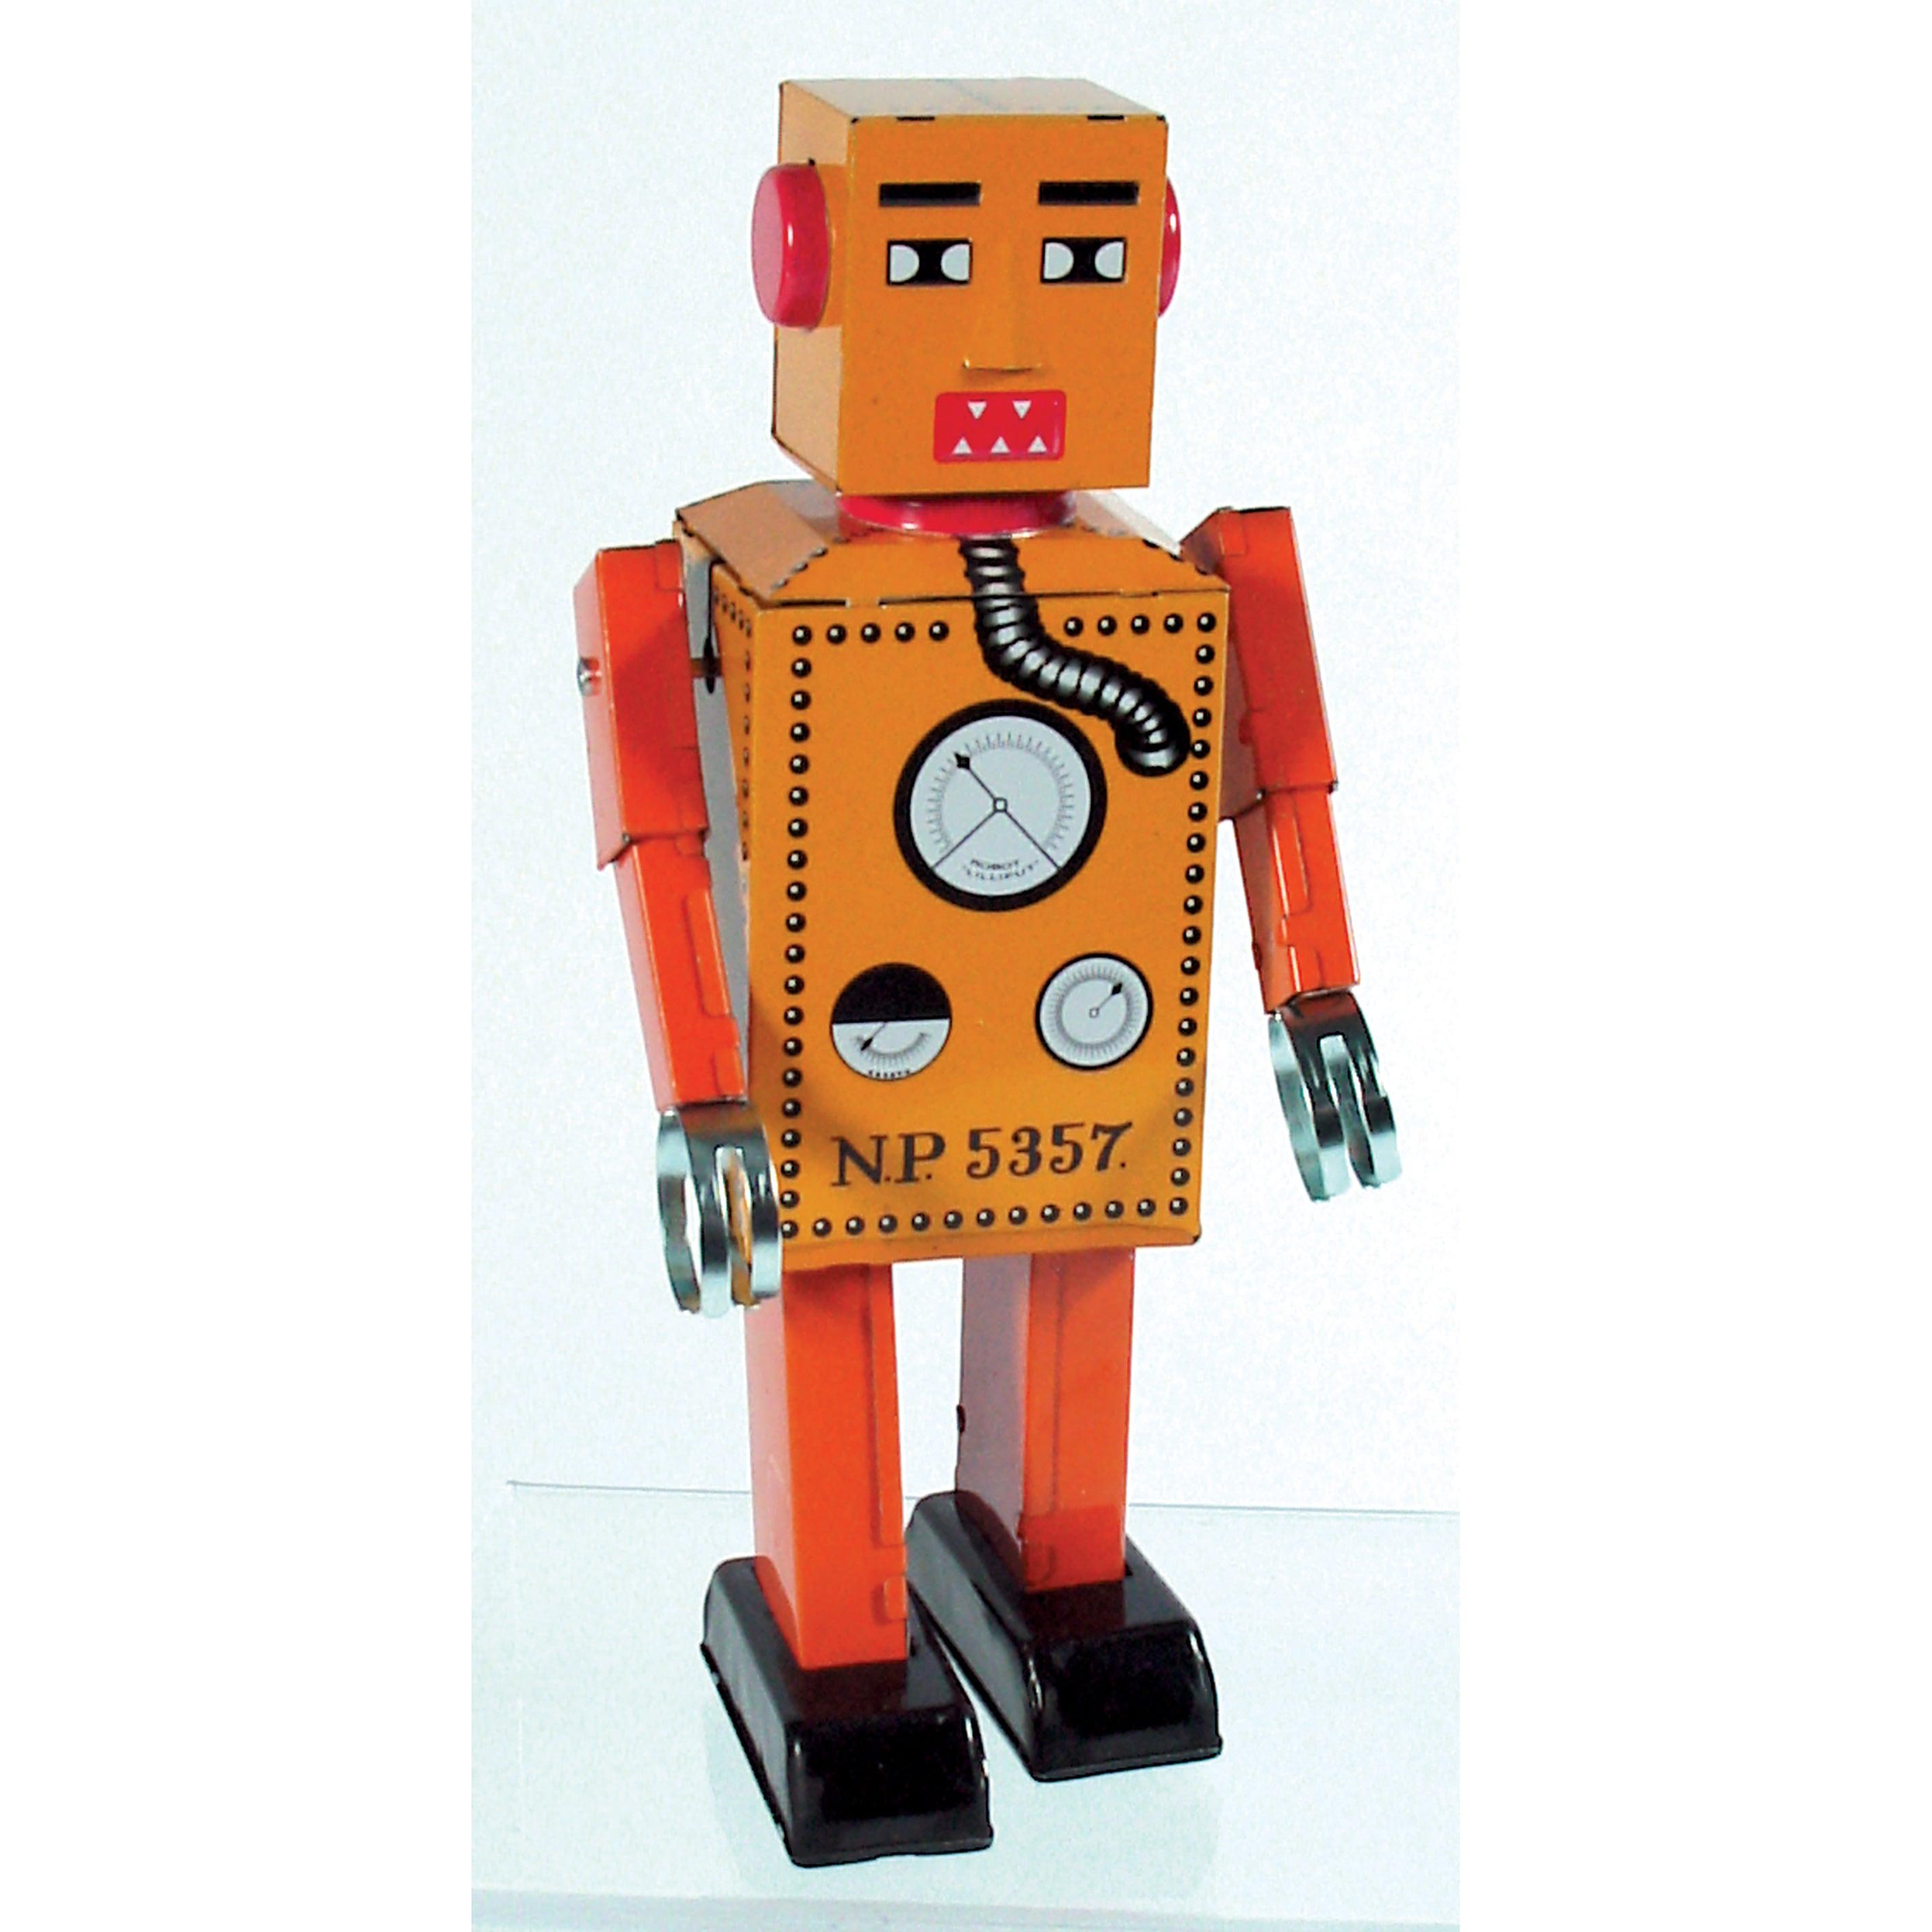 Schylling Large Lilliput Robot (G019649211340)